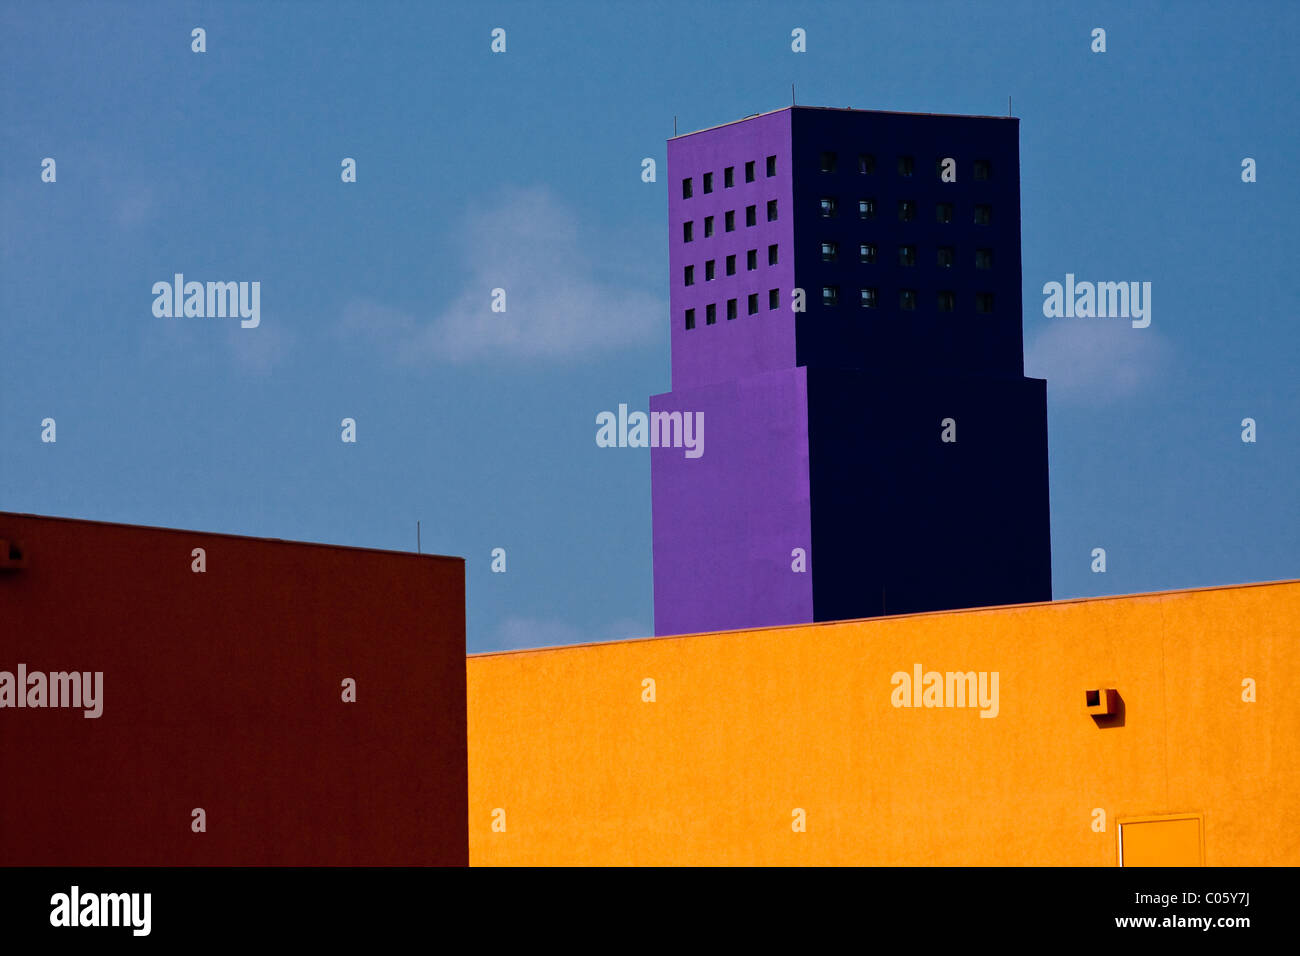 Colorful and distinctive architecture of the Latino Cultural Center in Dallas, Texas designed by architect Ricardo - Stock Image